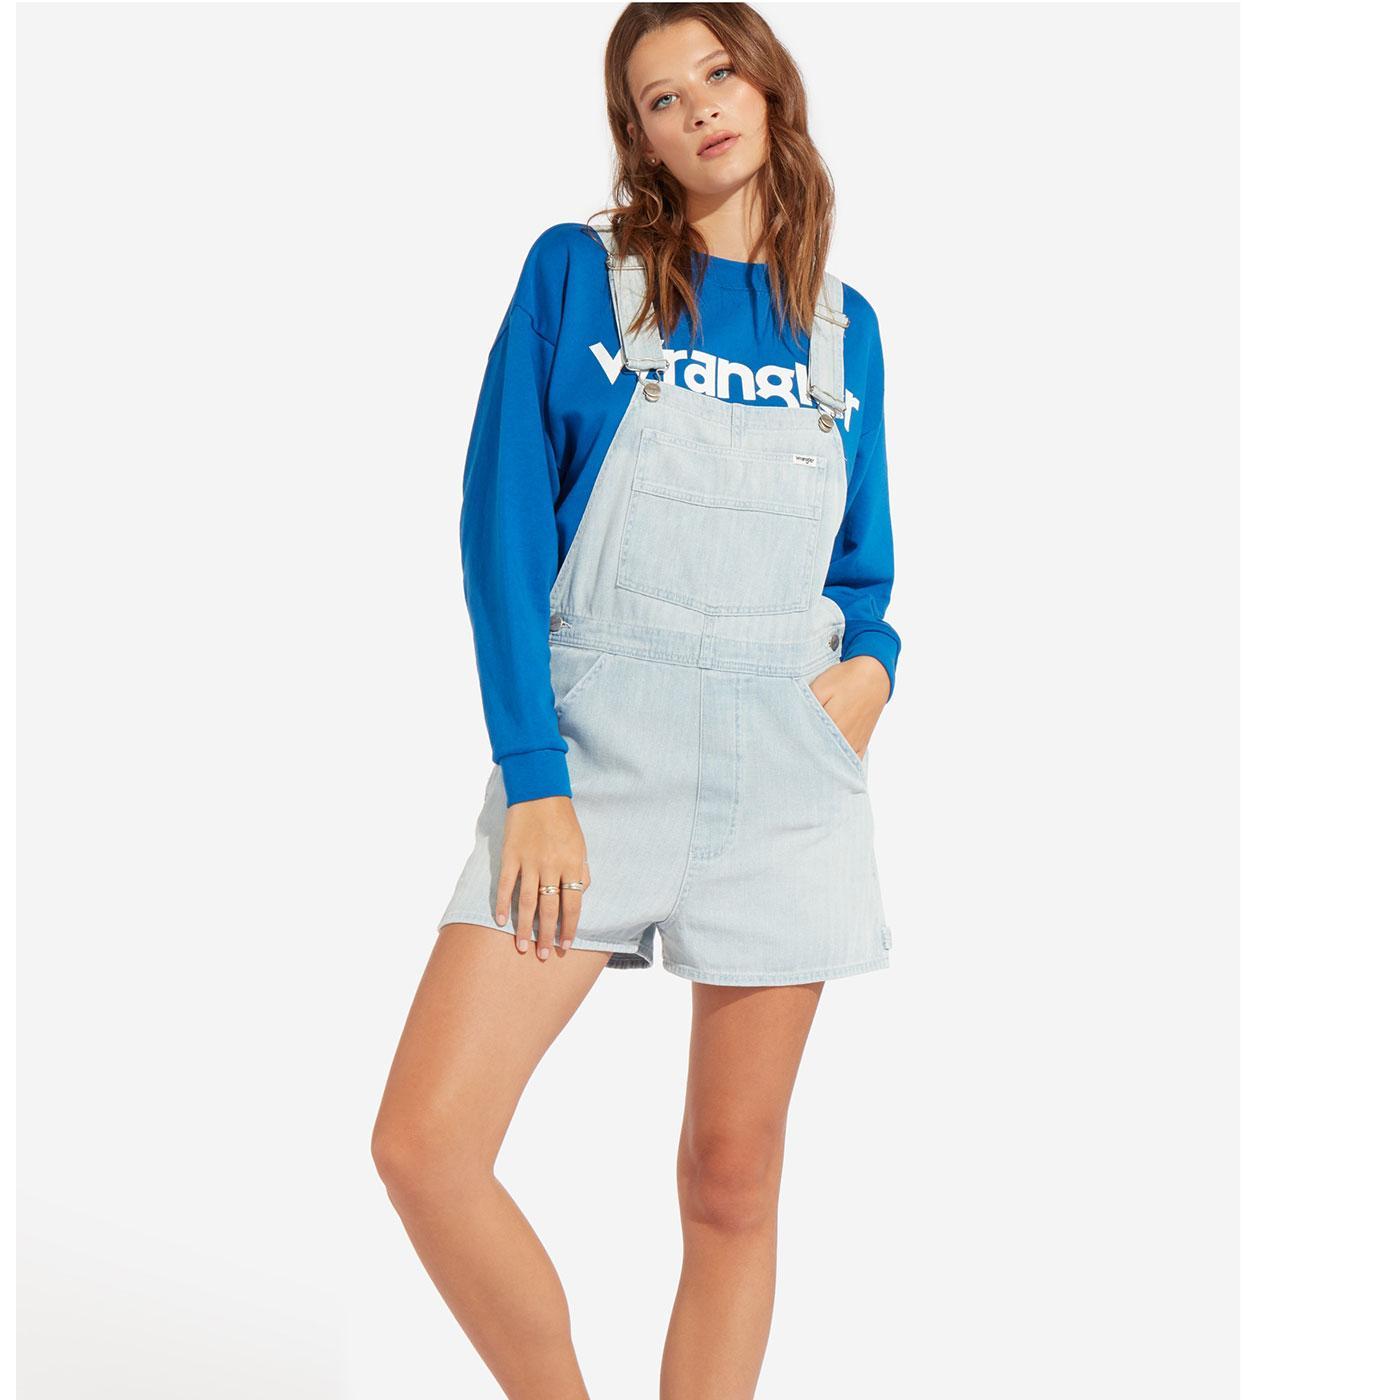 WRANGLER Womens Retro Herringbone Denim Bib Shorts